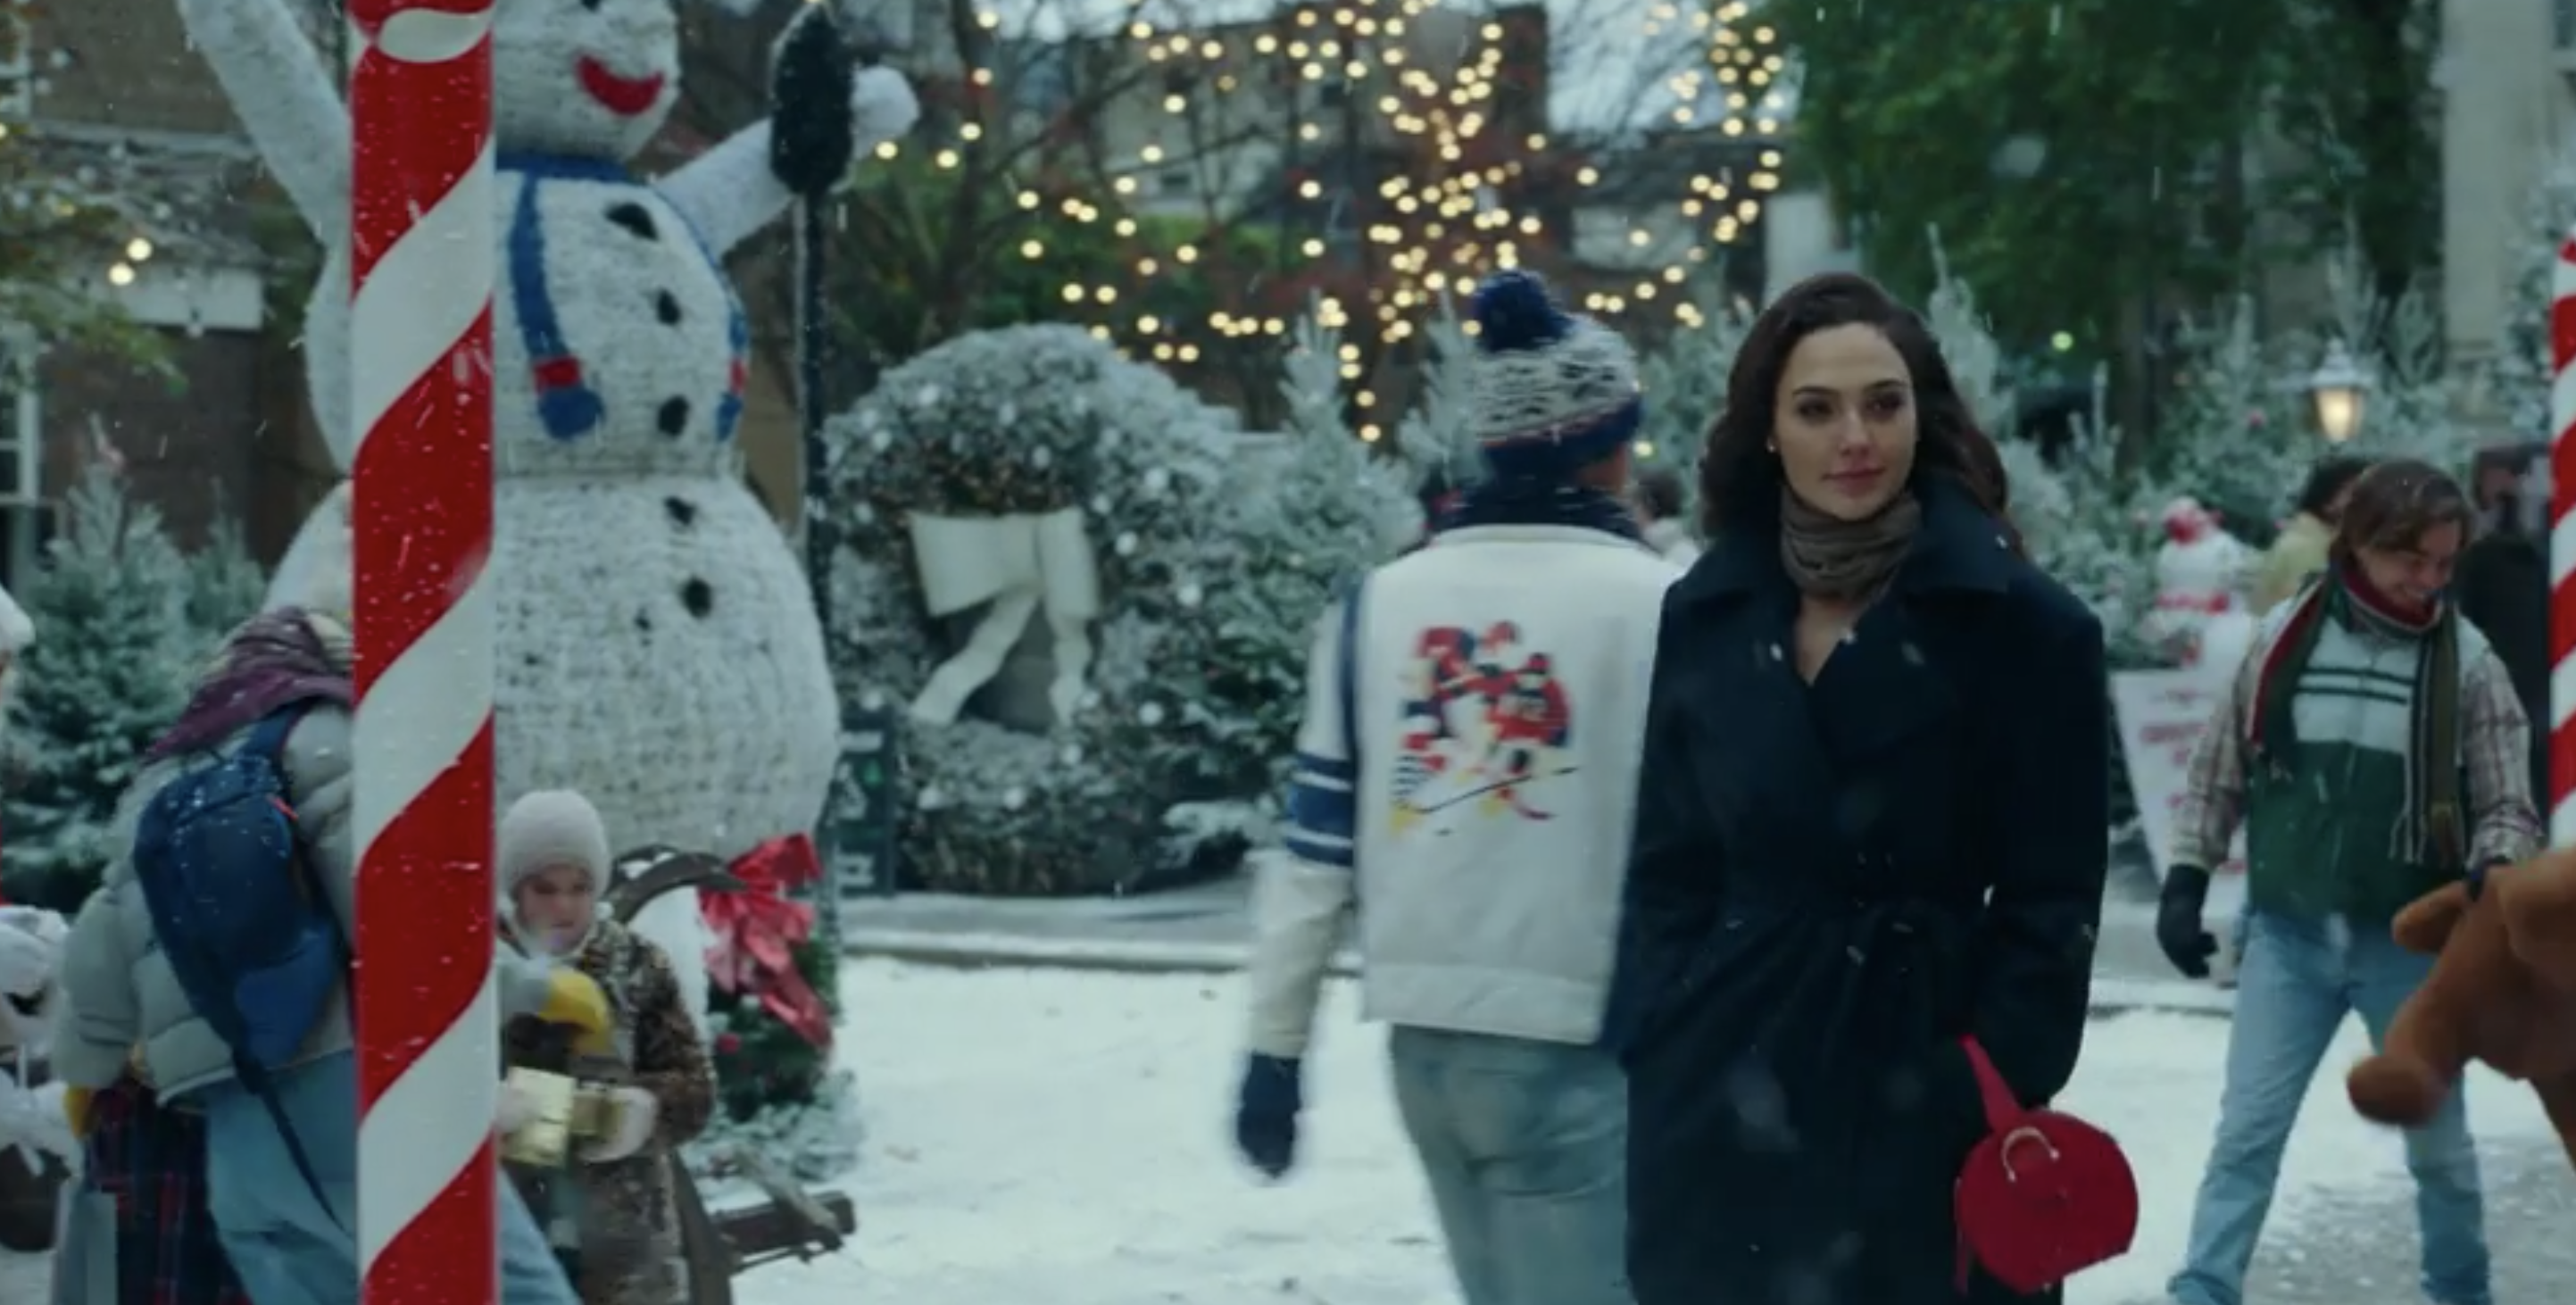 Diana walking through a Christmas market